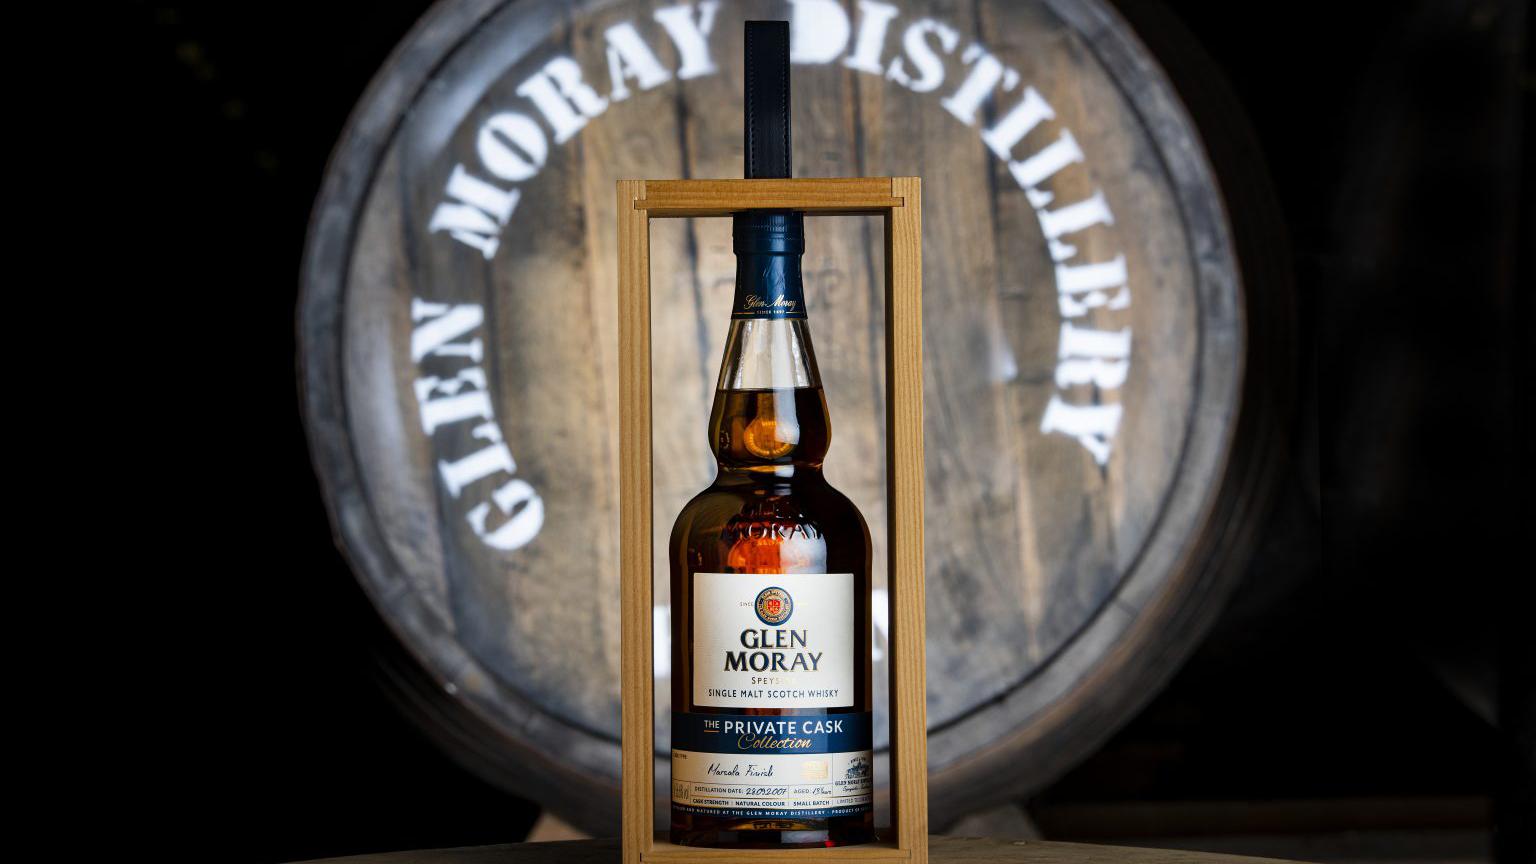 Glen Moray Private Cask Collection 13 Marsala